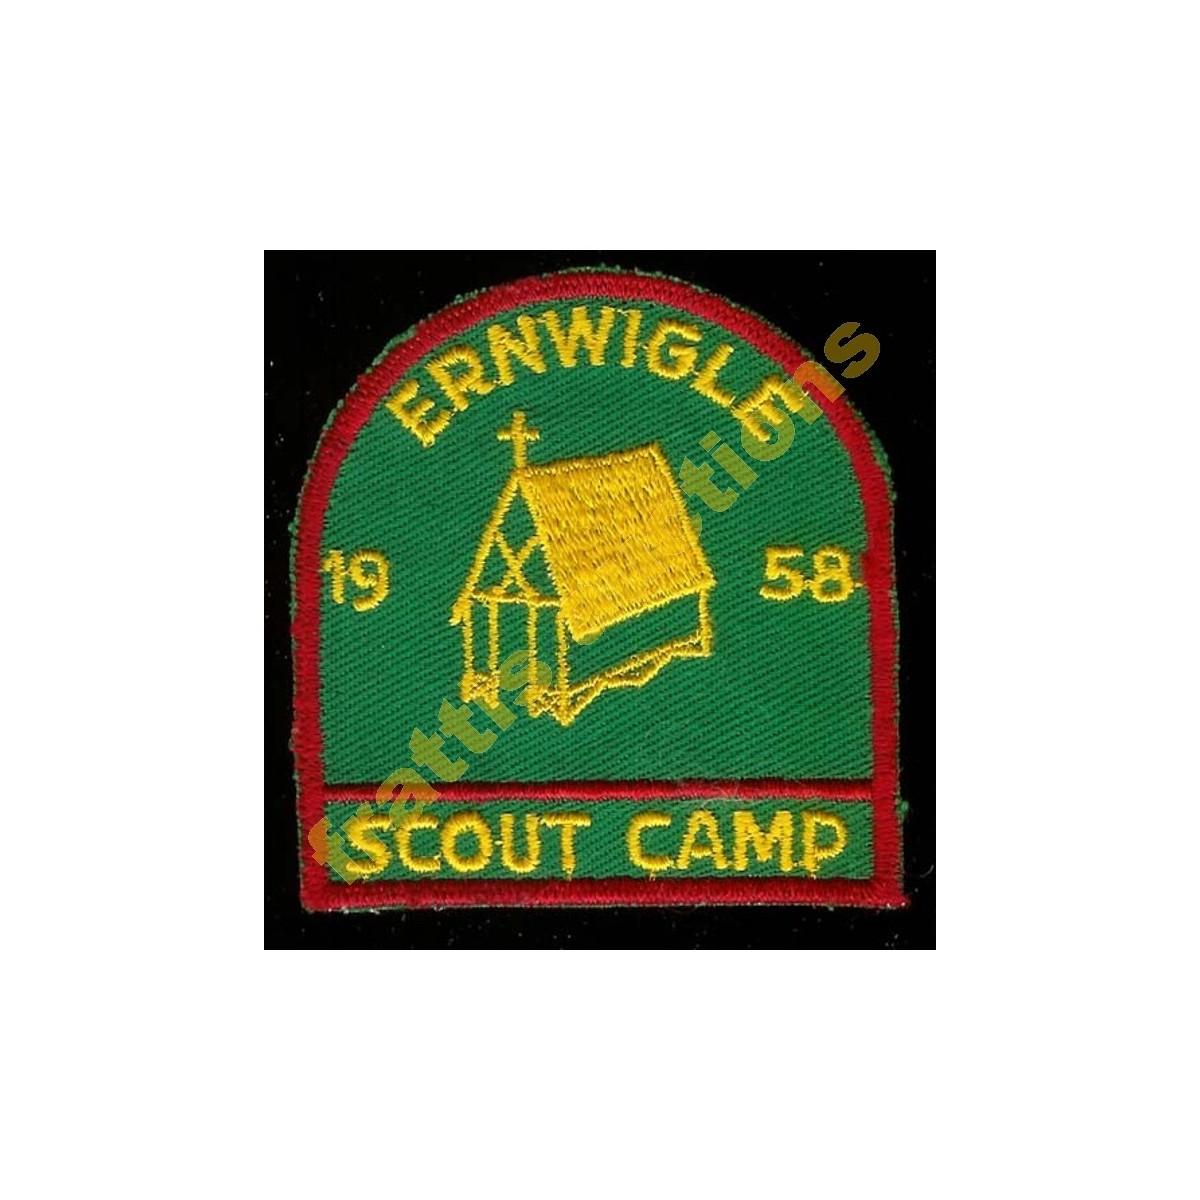 Ernwigle Scouts Camp, 1958, Καναδάς.